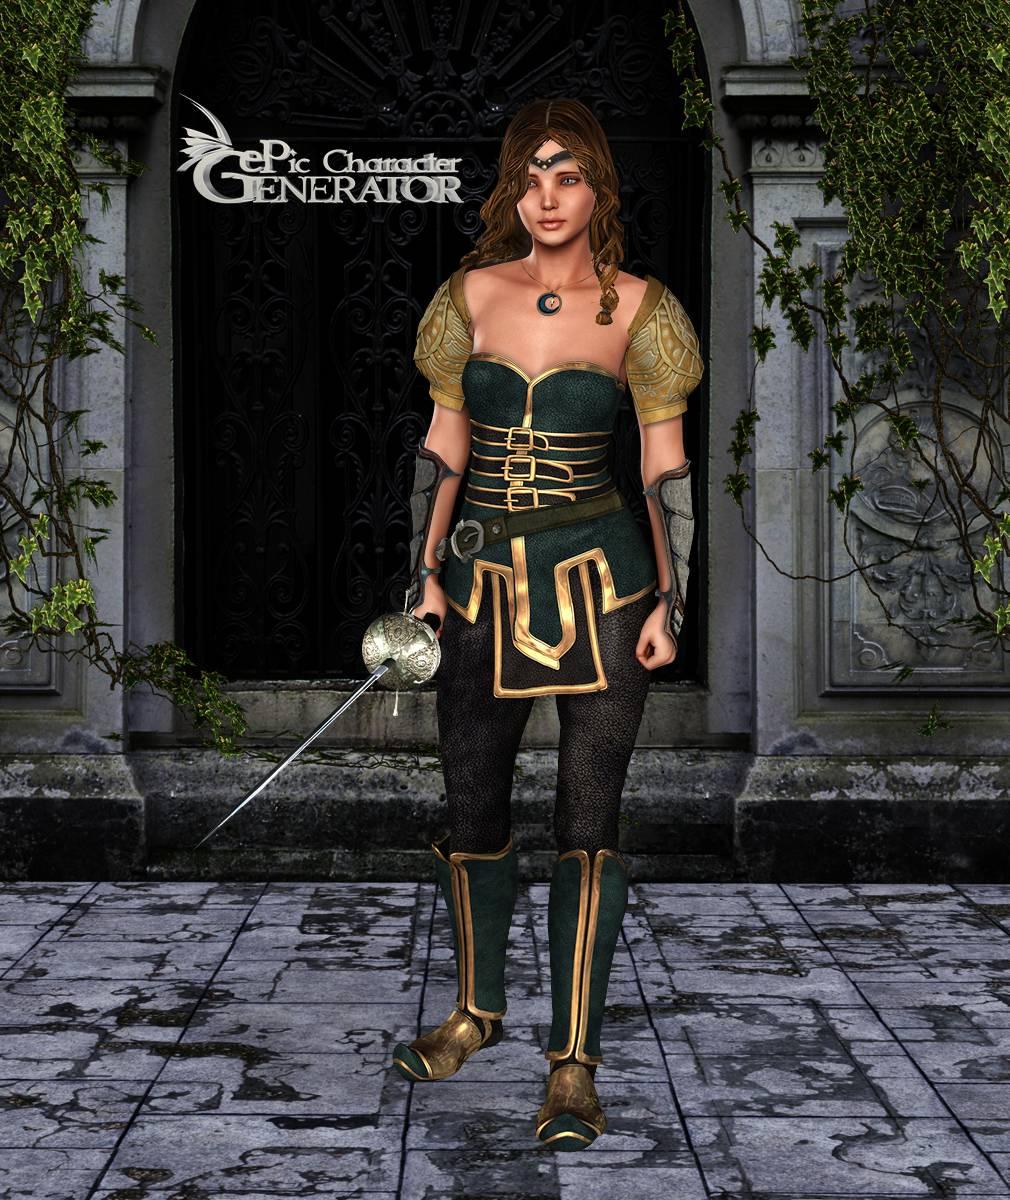 ePic Character Generator Season 2 Female Adventurer 2 Screenshot 06